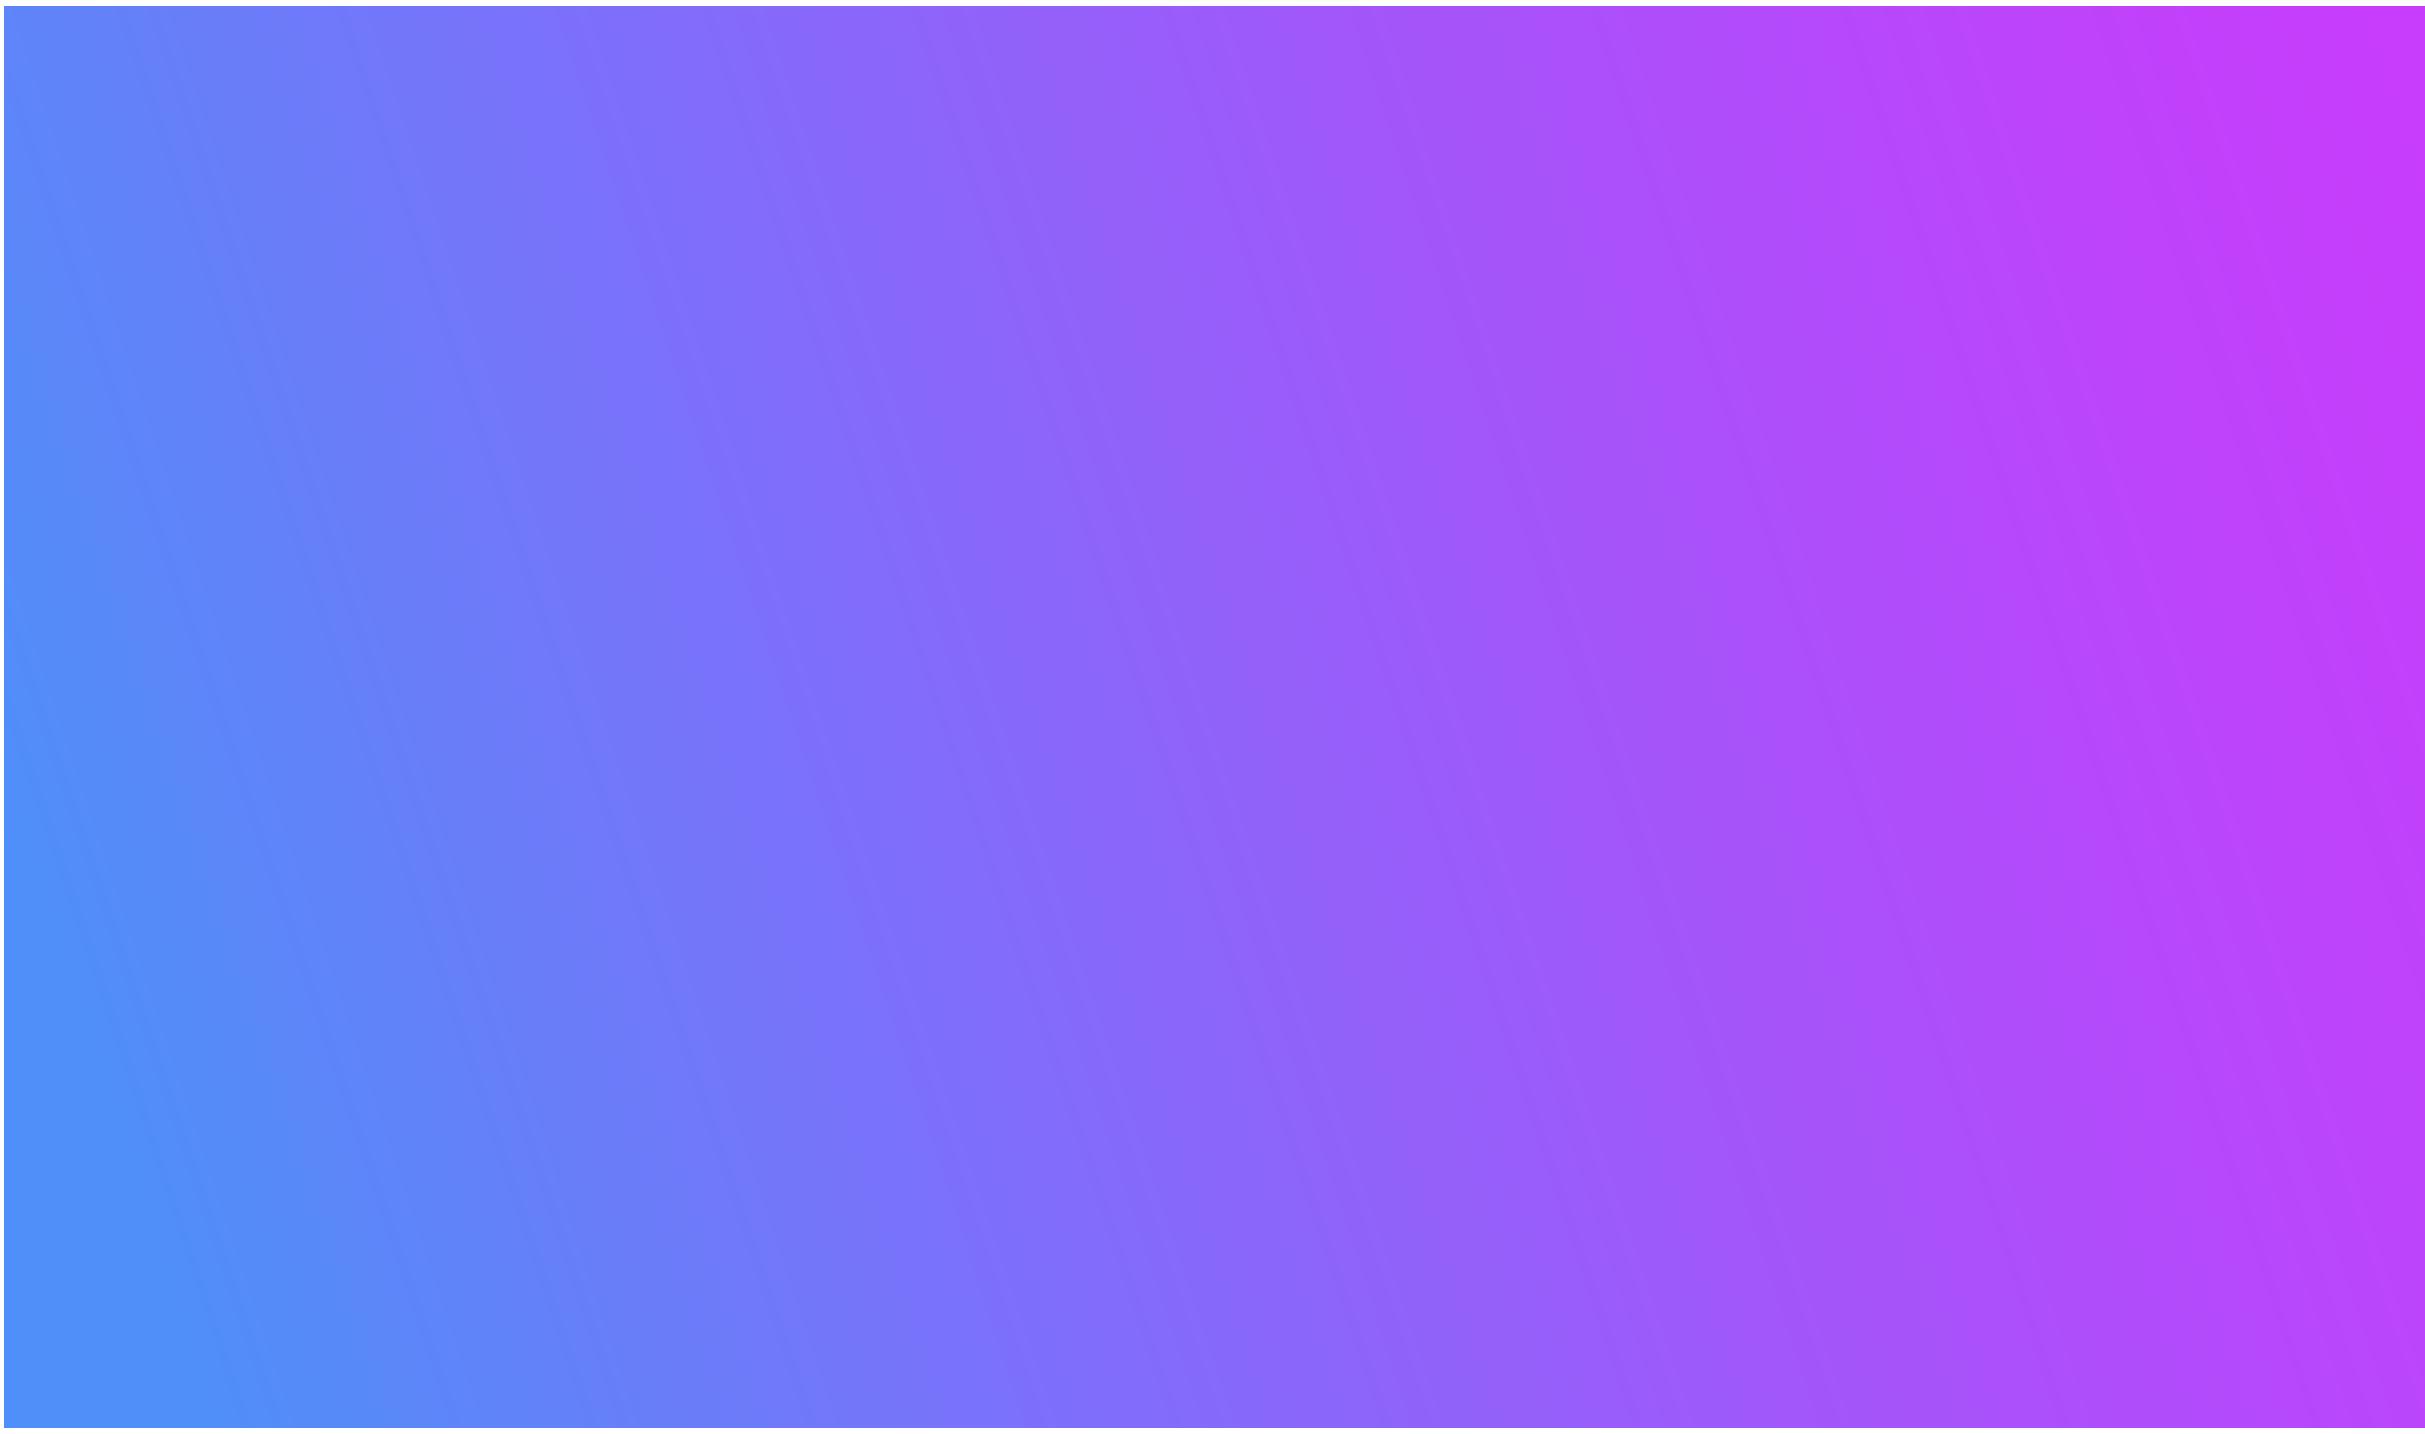 gradient 3-01